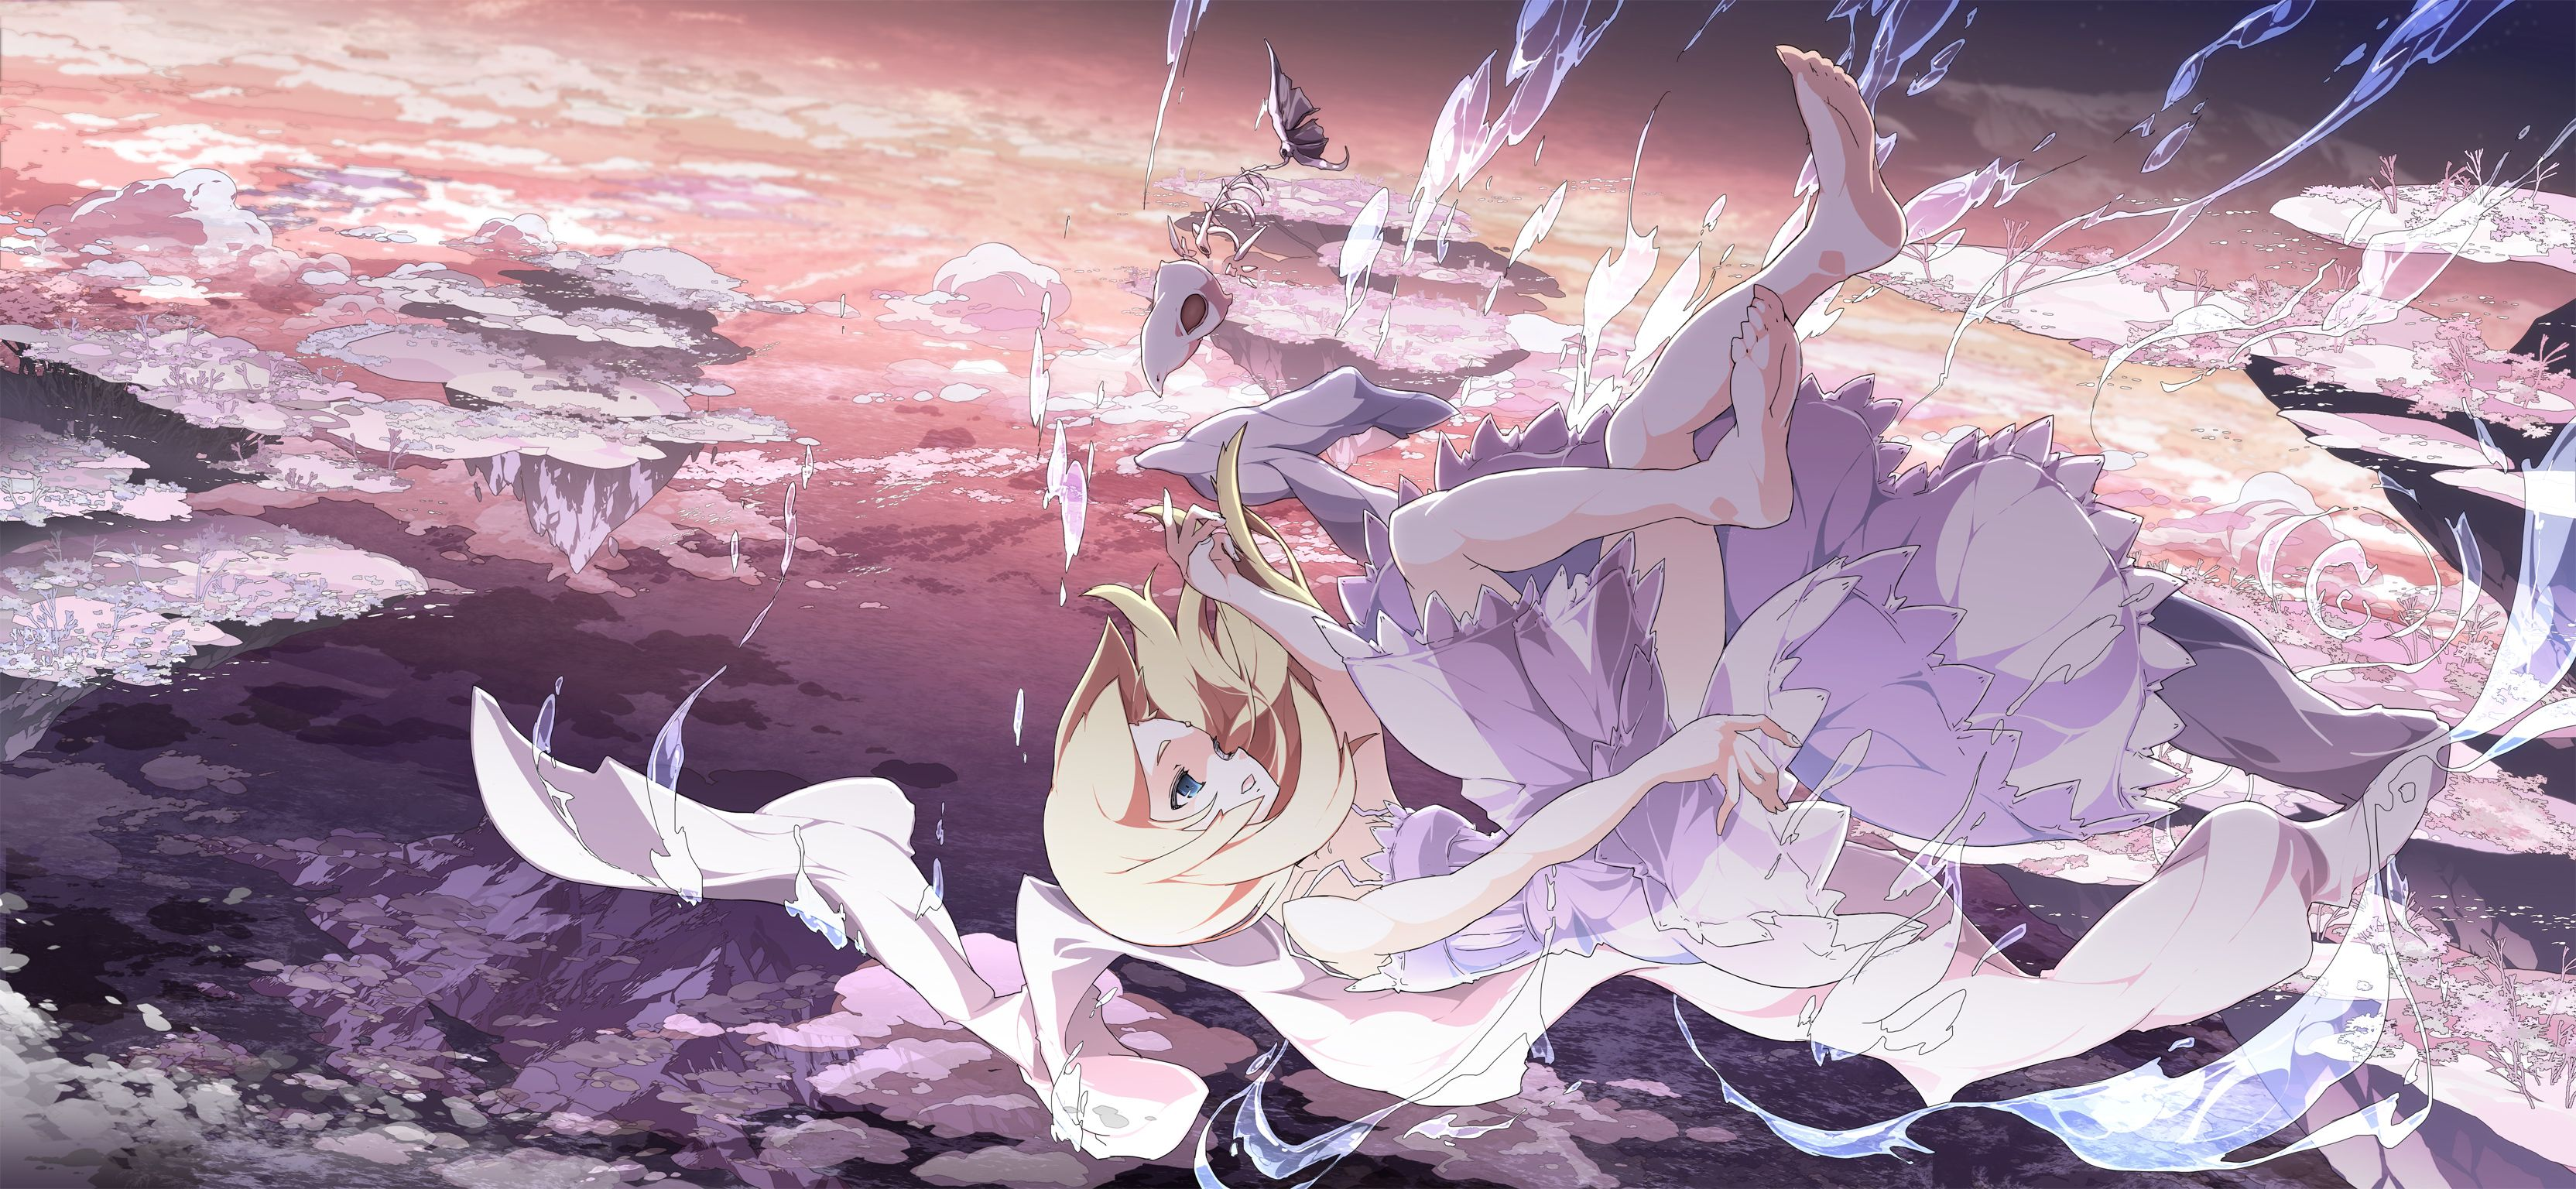 Anime Wallpaper 2020 Sky anime Cool anime pictures Anime 3328x1536